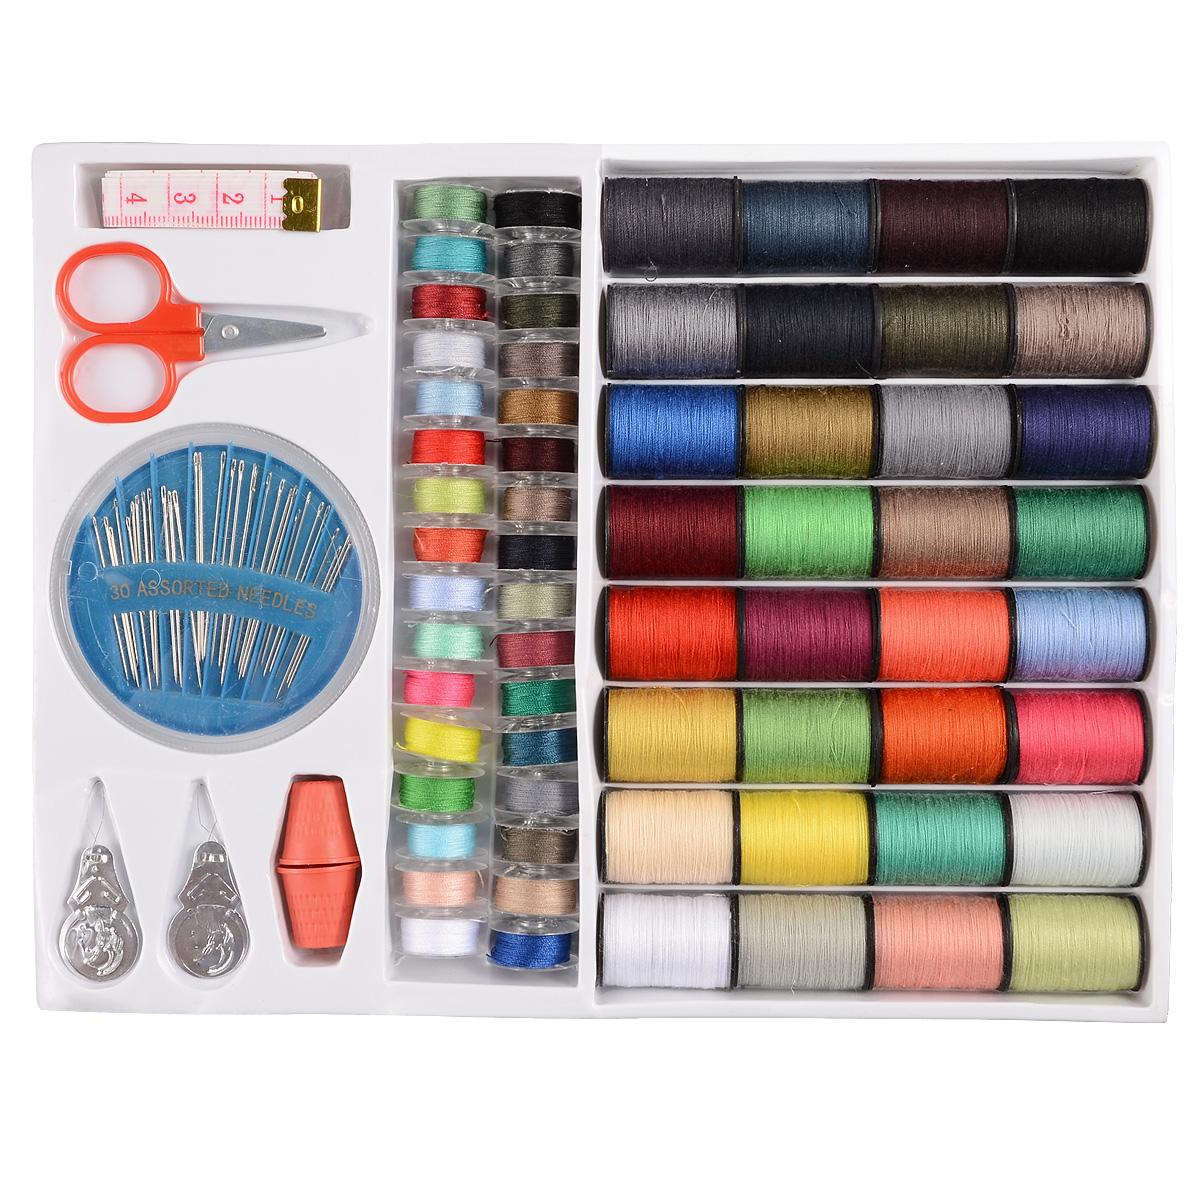 Kit de costura 64 piezas hilos de colores set de costura para m quina de coser ebay - Set de costura ...